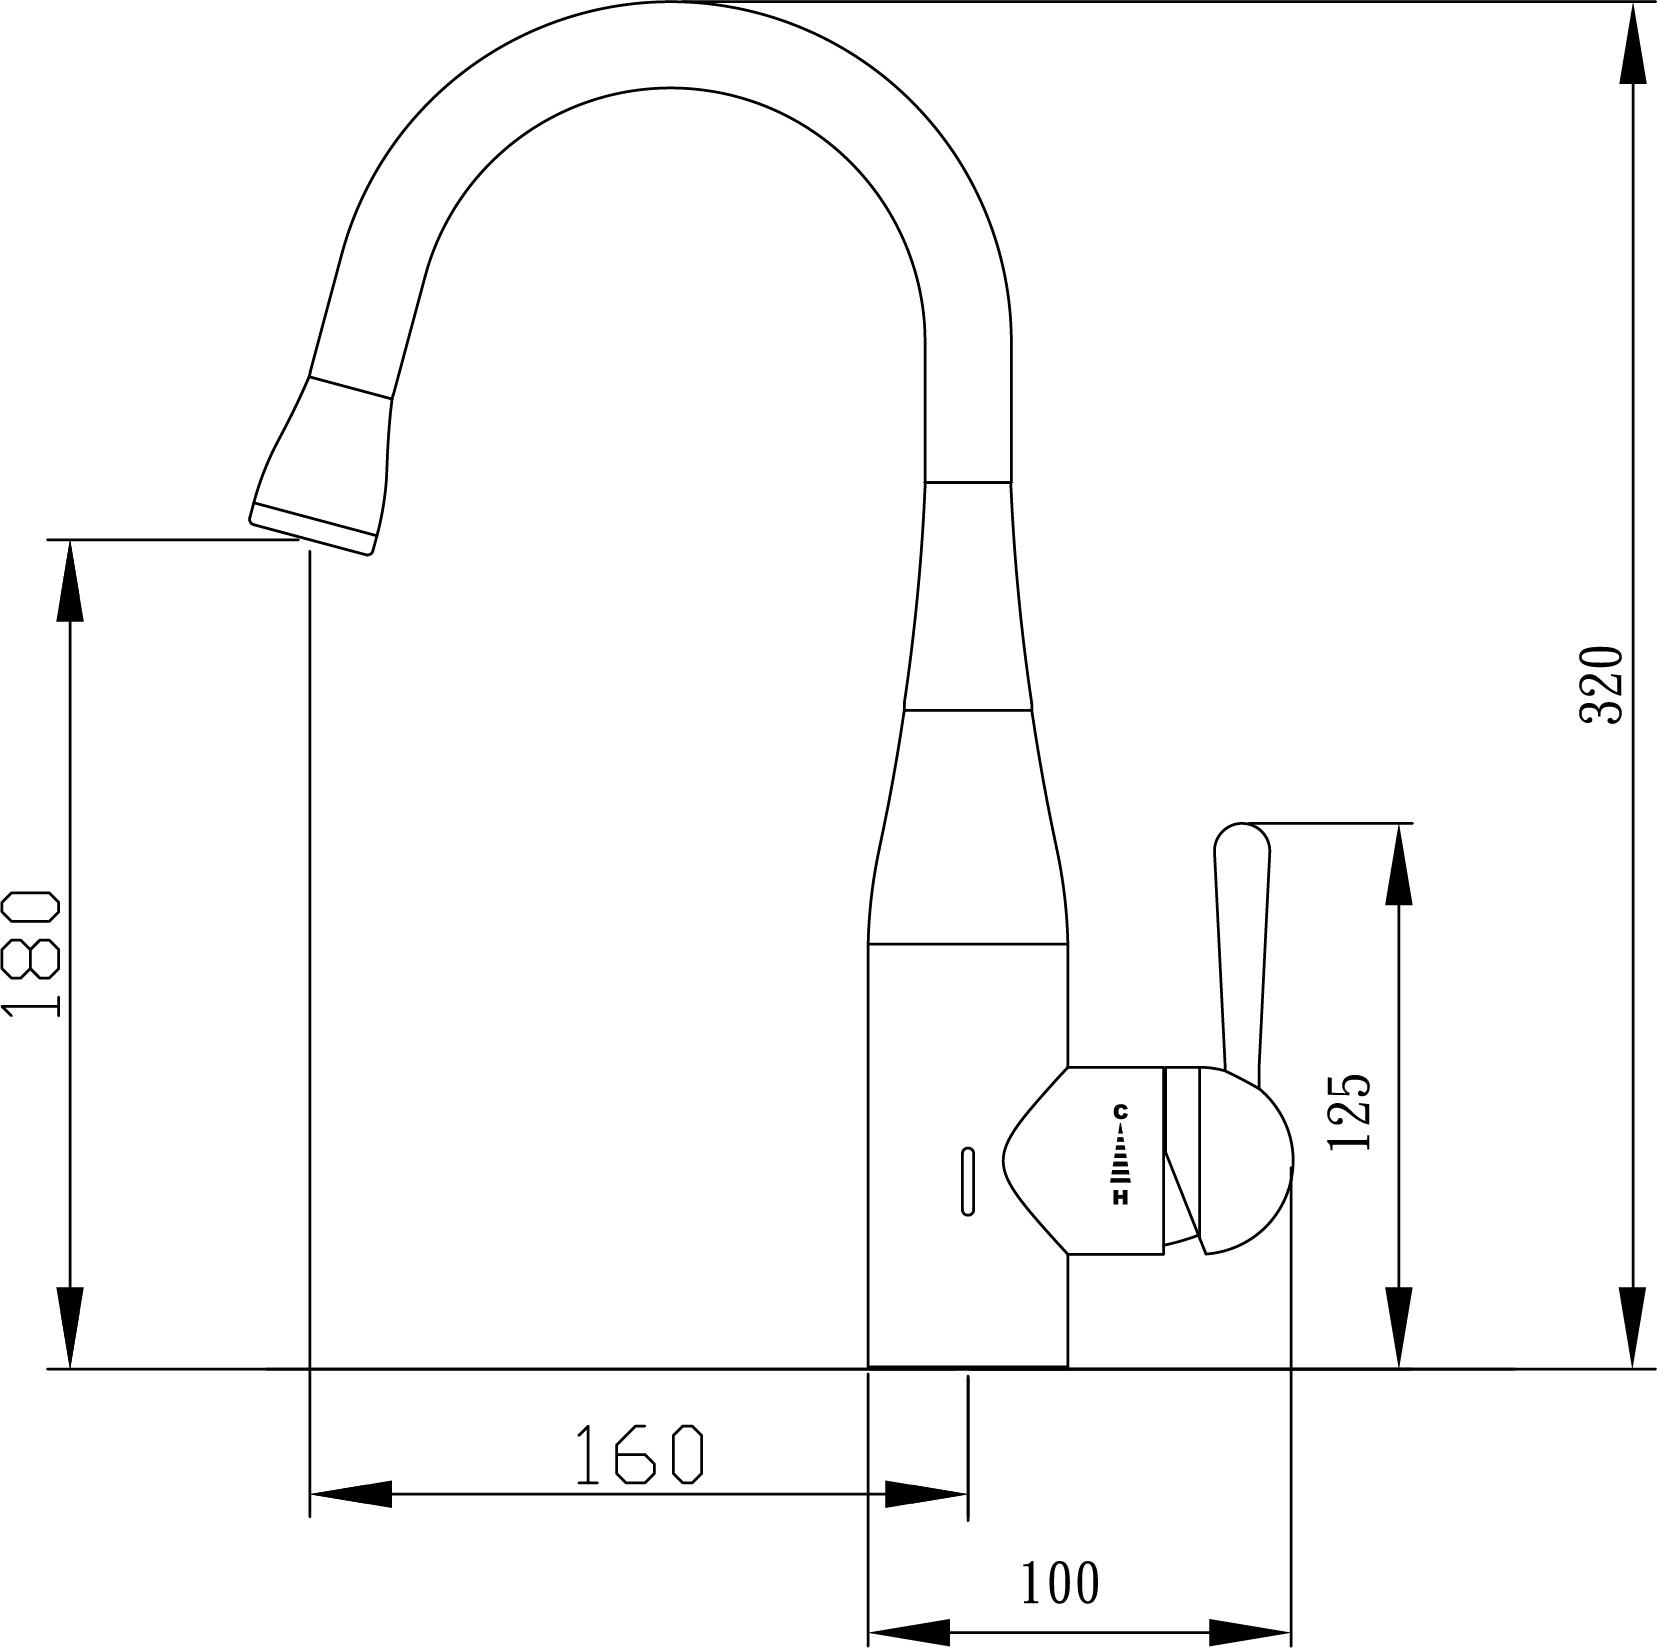 Aqualogic Ozone Gooseneck Mixer